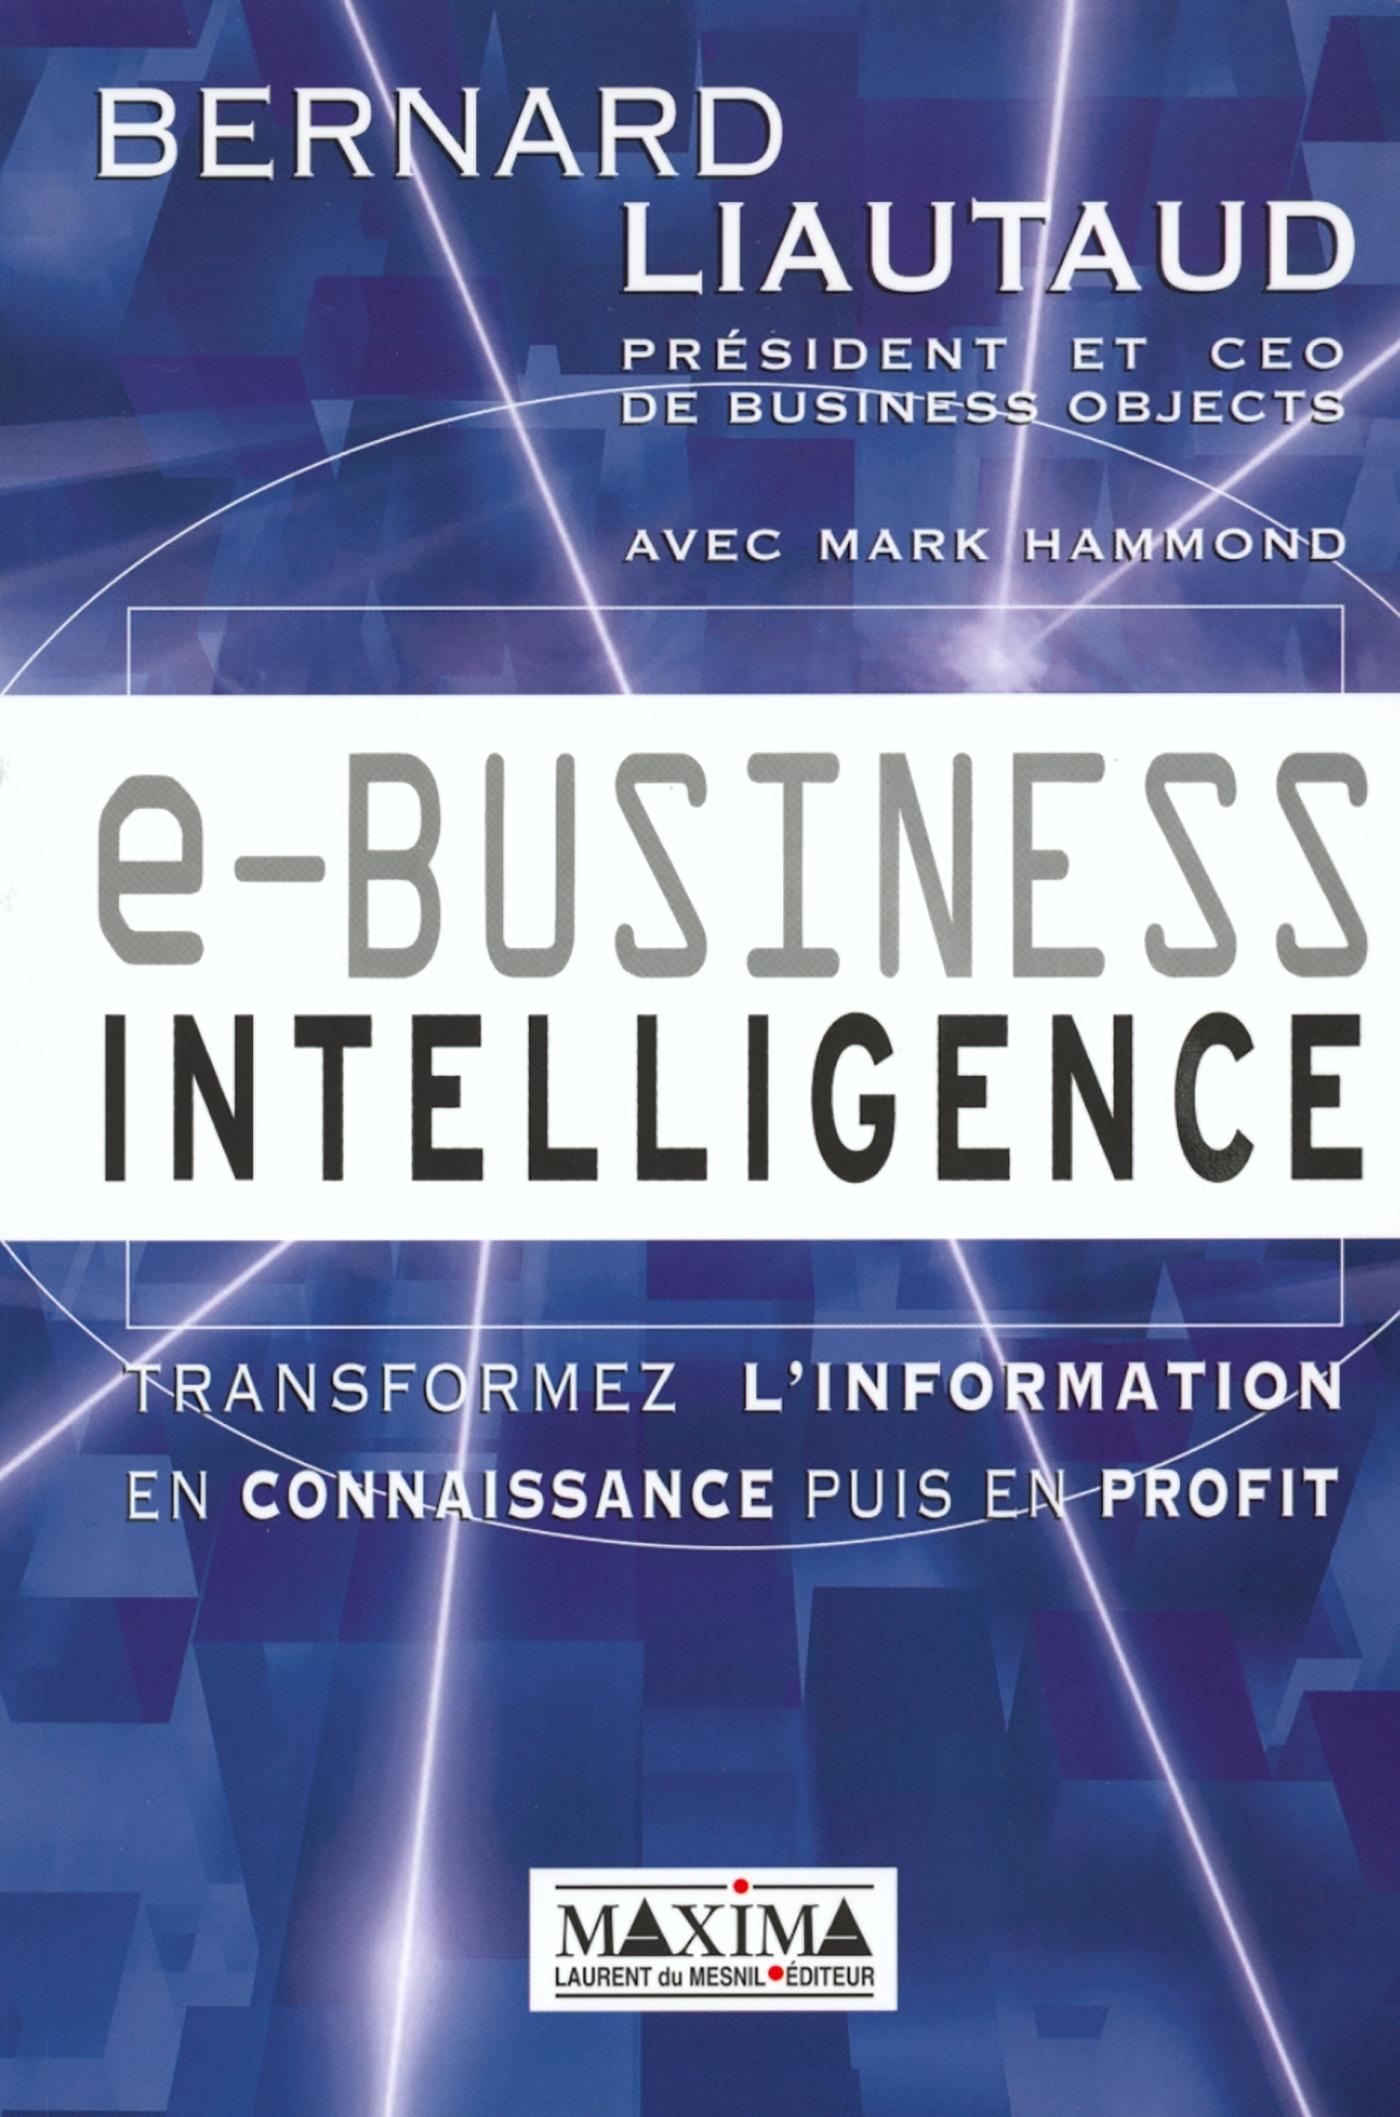 E BUSINESS INTELLIGENCE